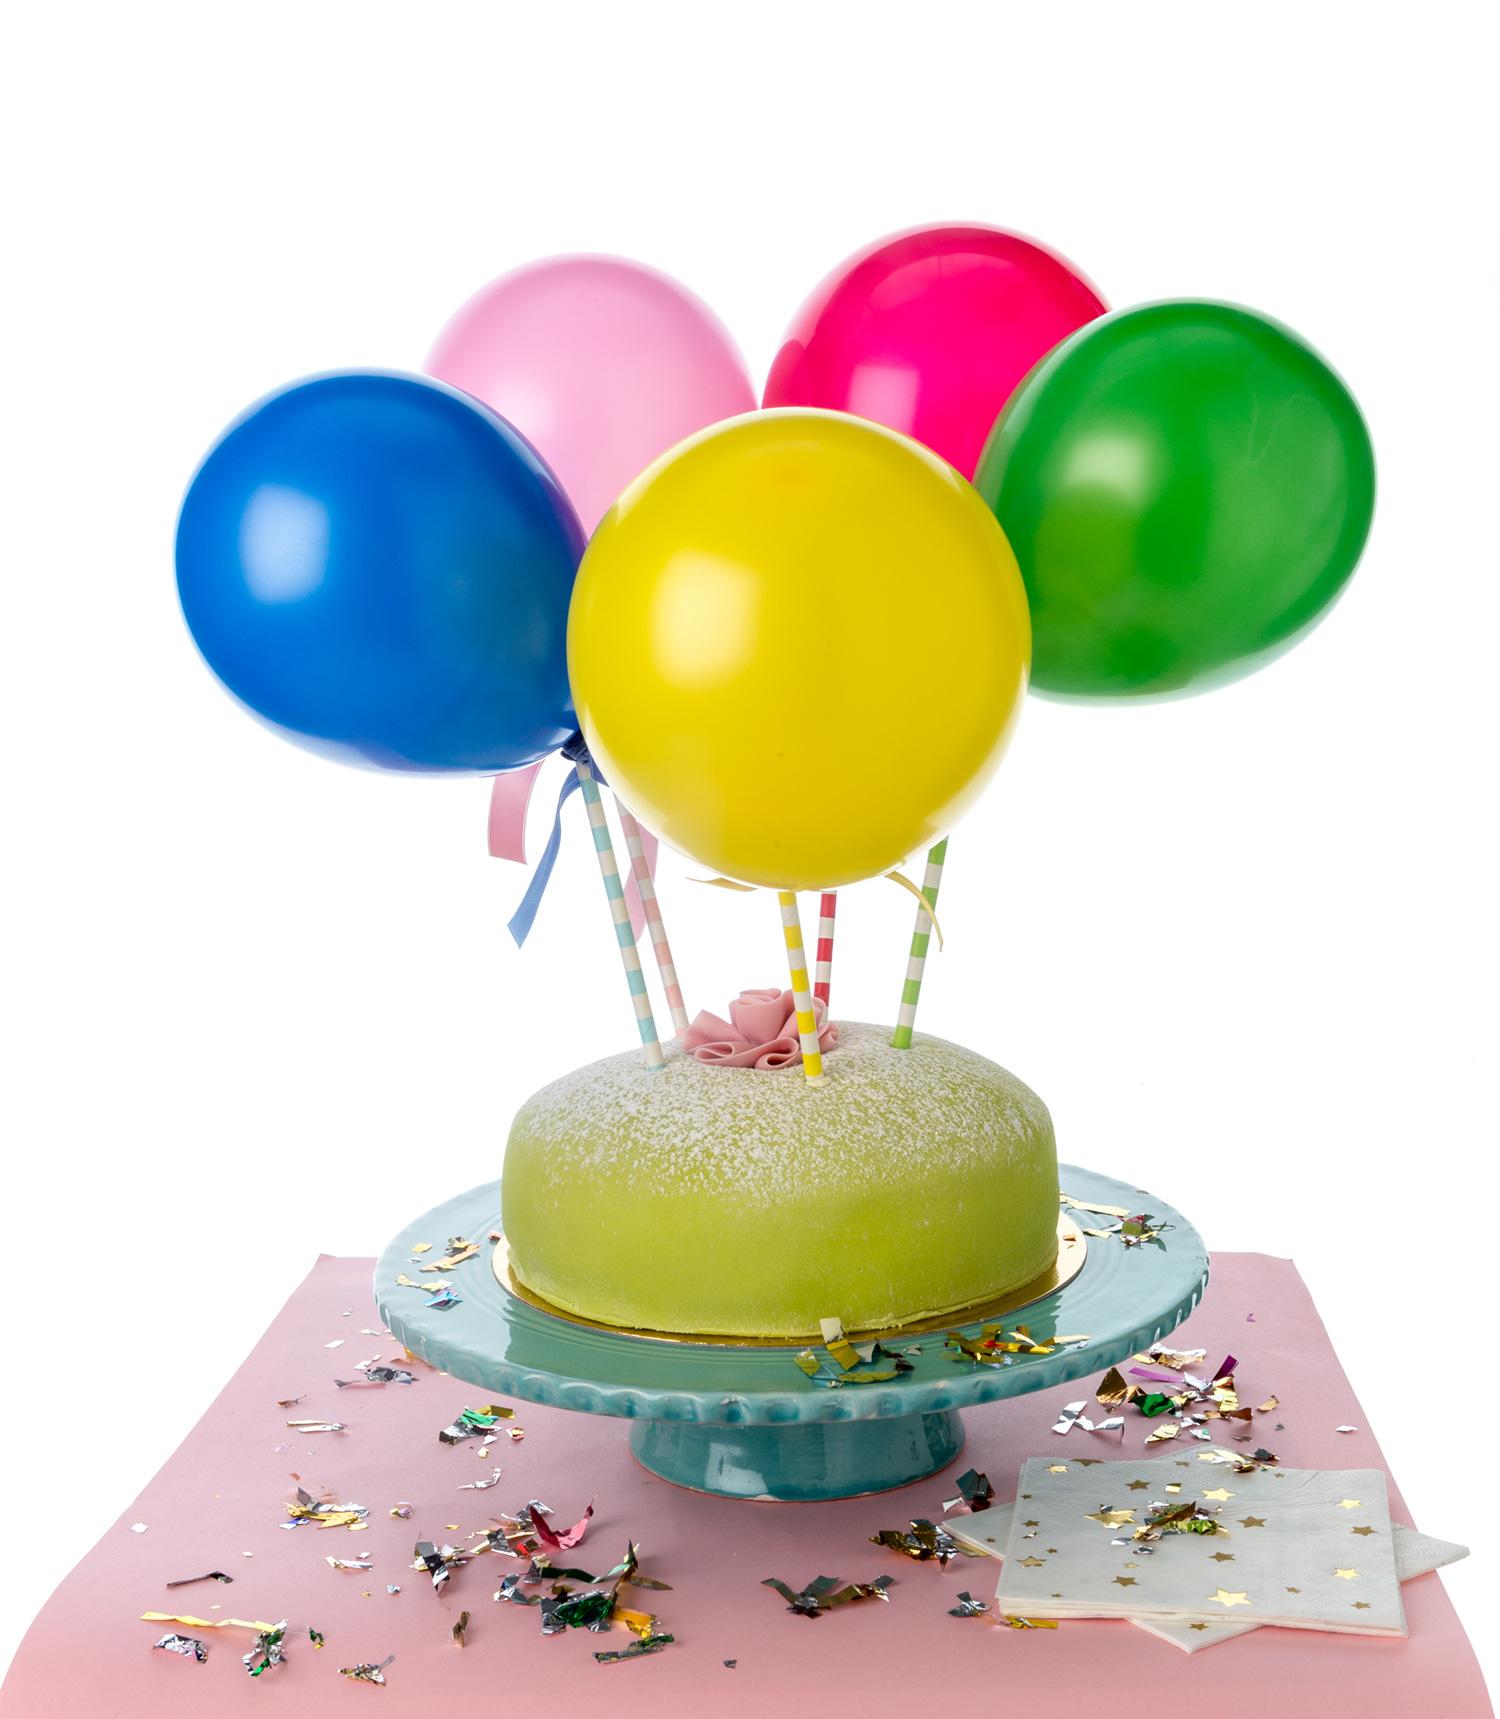 miniballonger som tårtdekoration på prinsesstårta